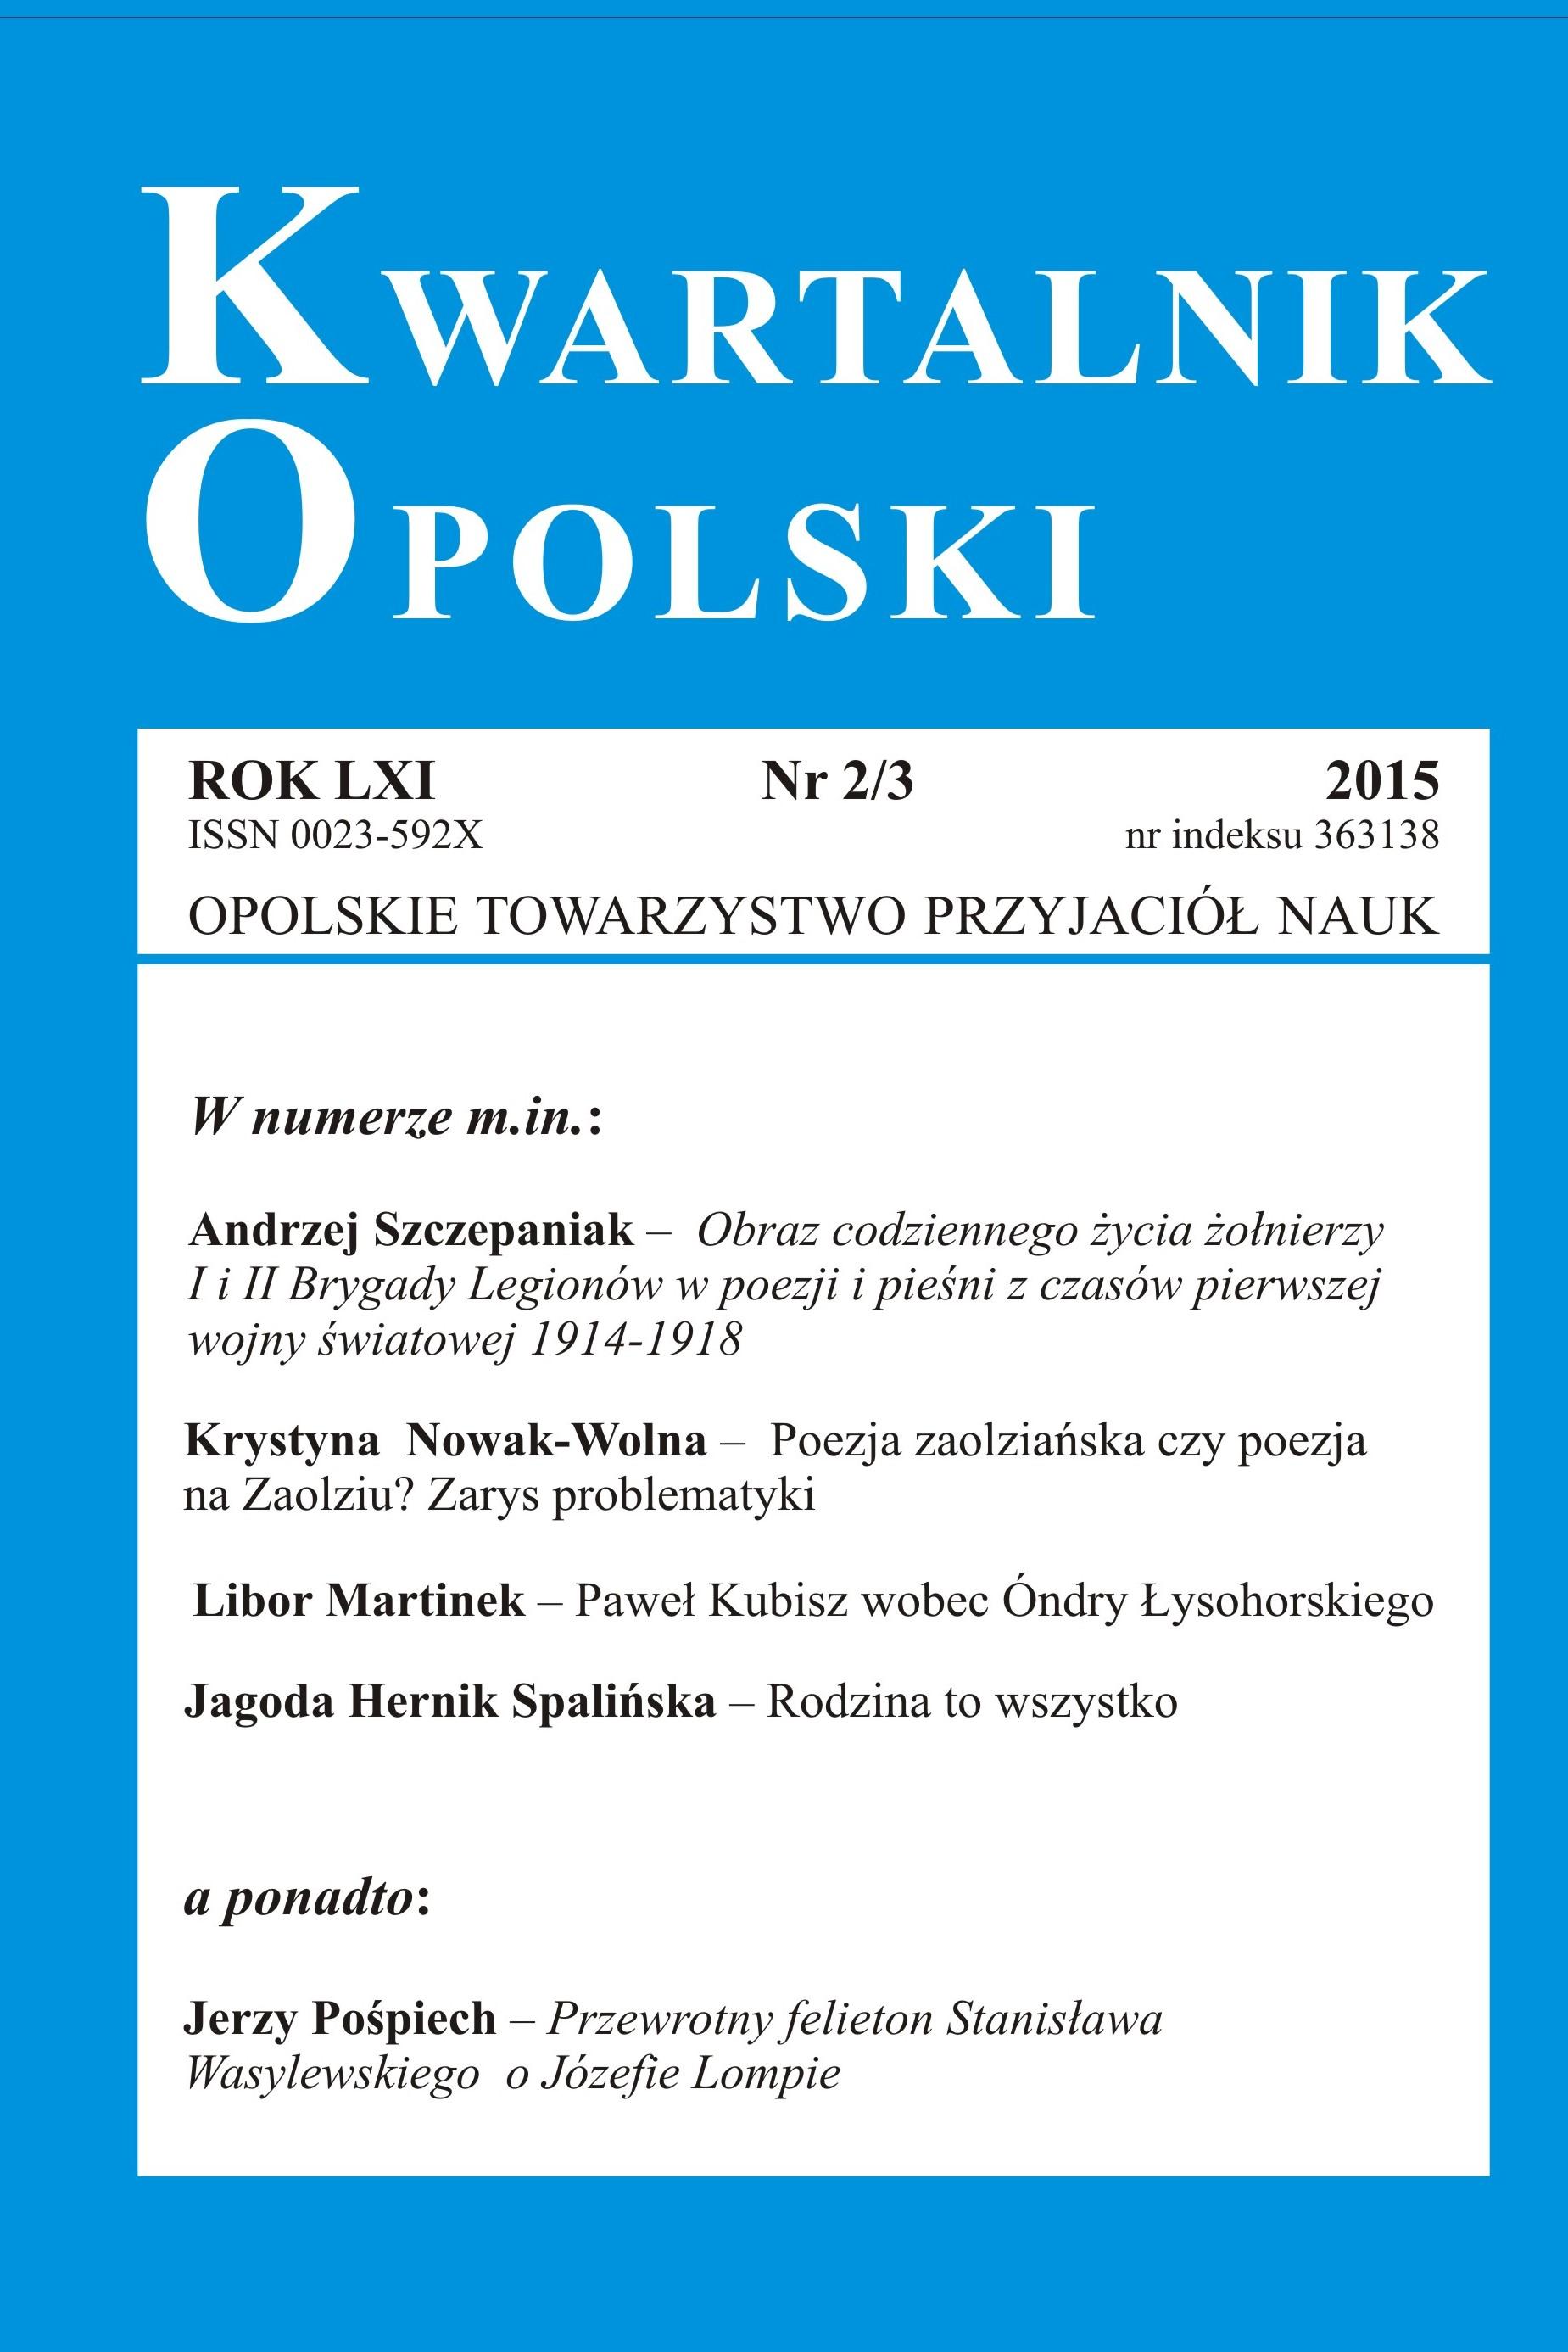 Kwartalnik Opolski 2/3 2015